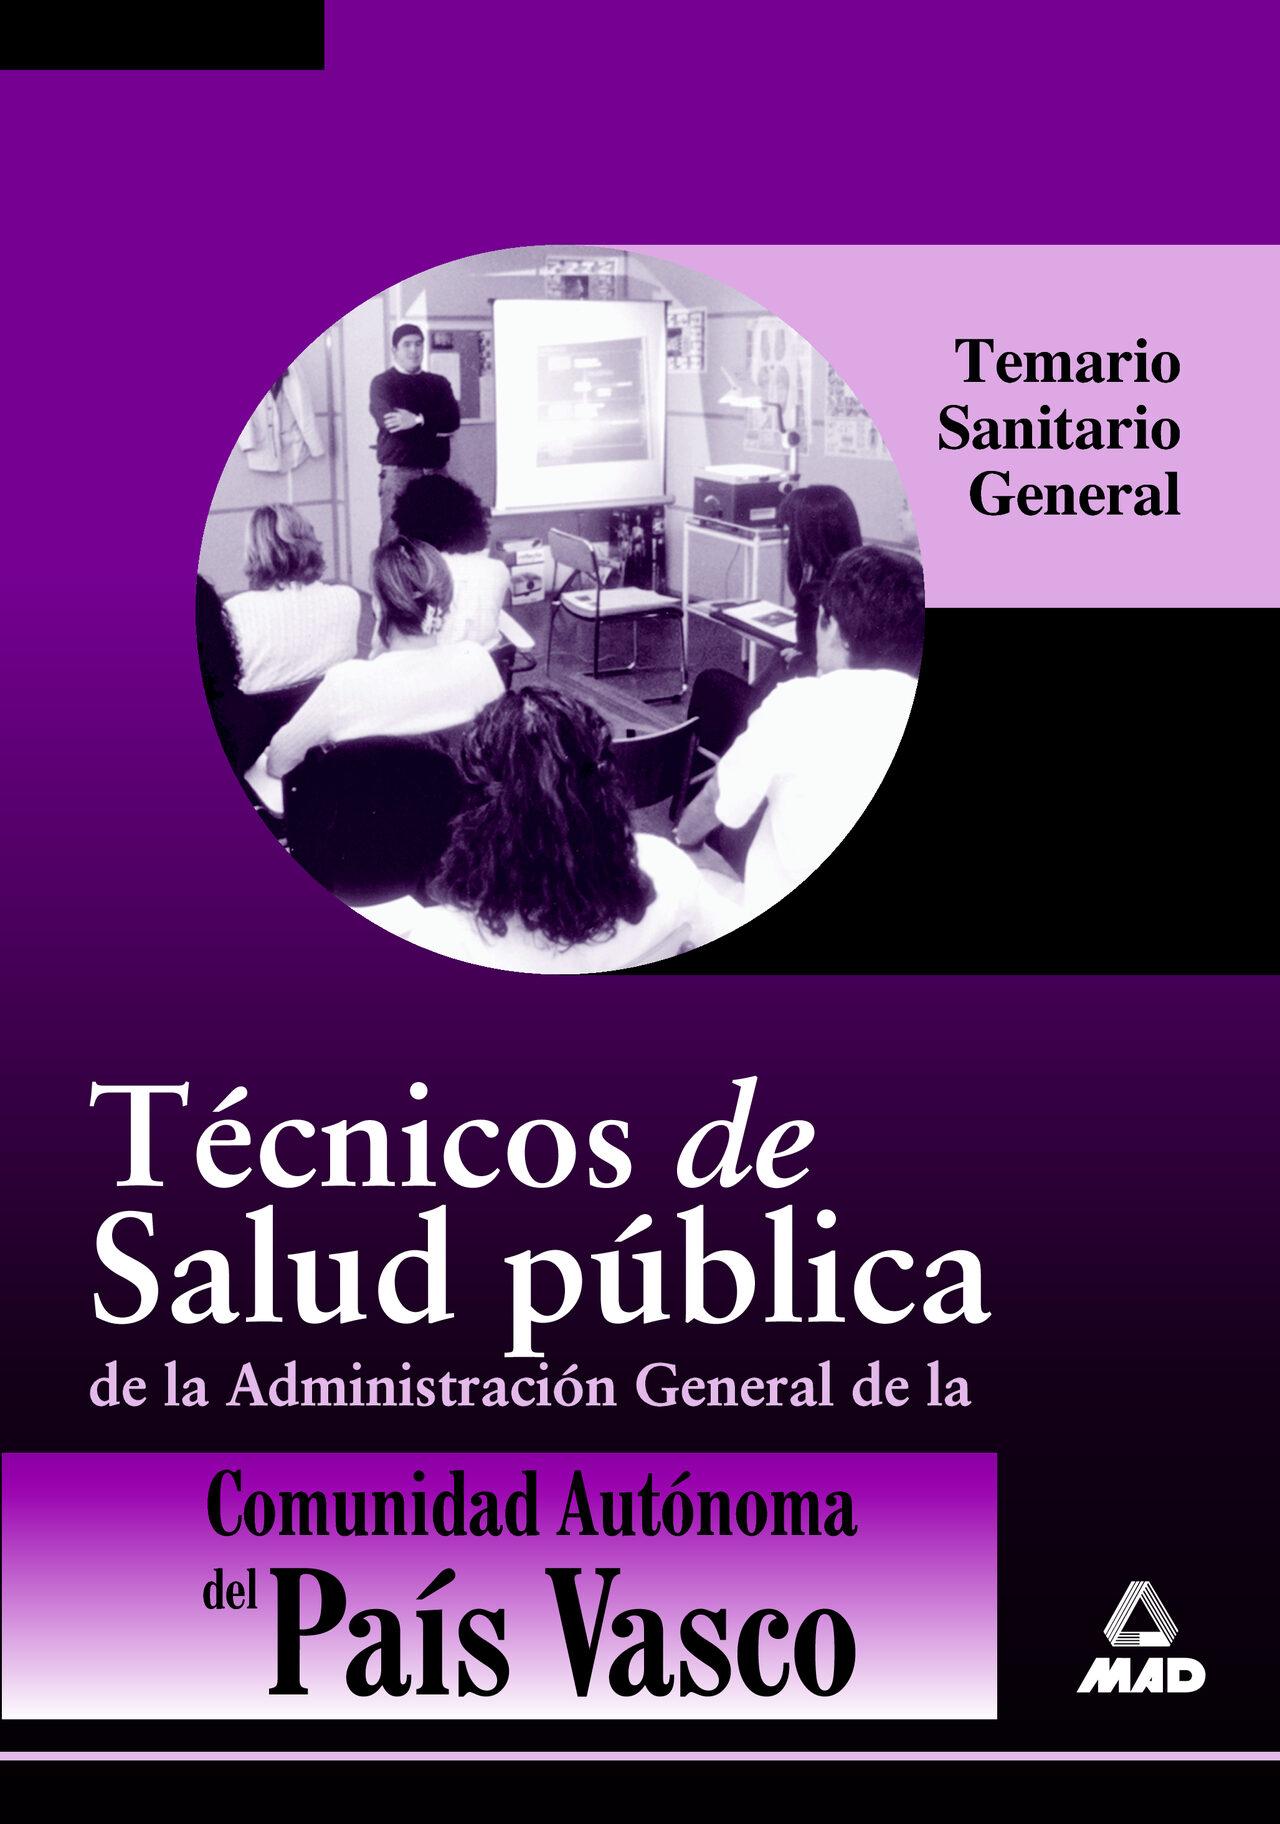 tecnico de salud publica de la administracion general de la comun idad autonoma del pais vasco-9788483119914